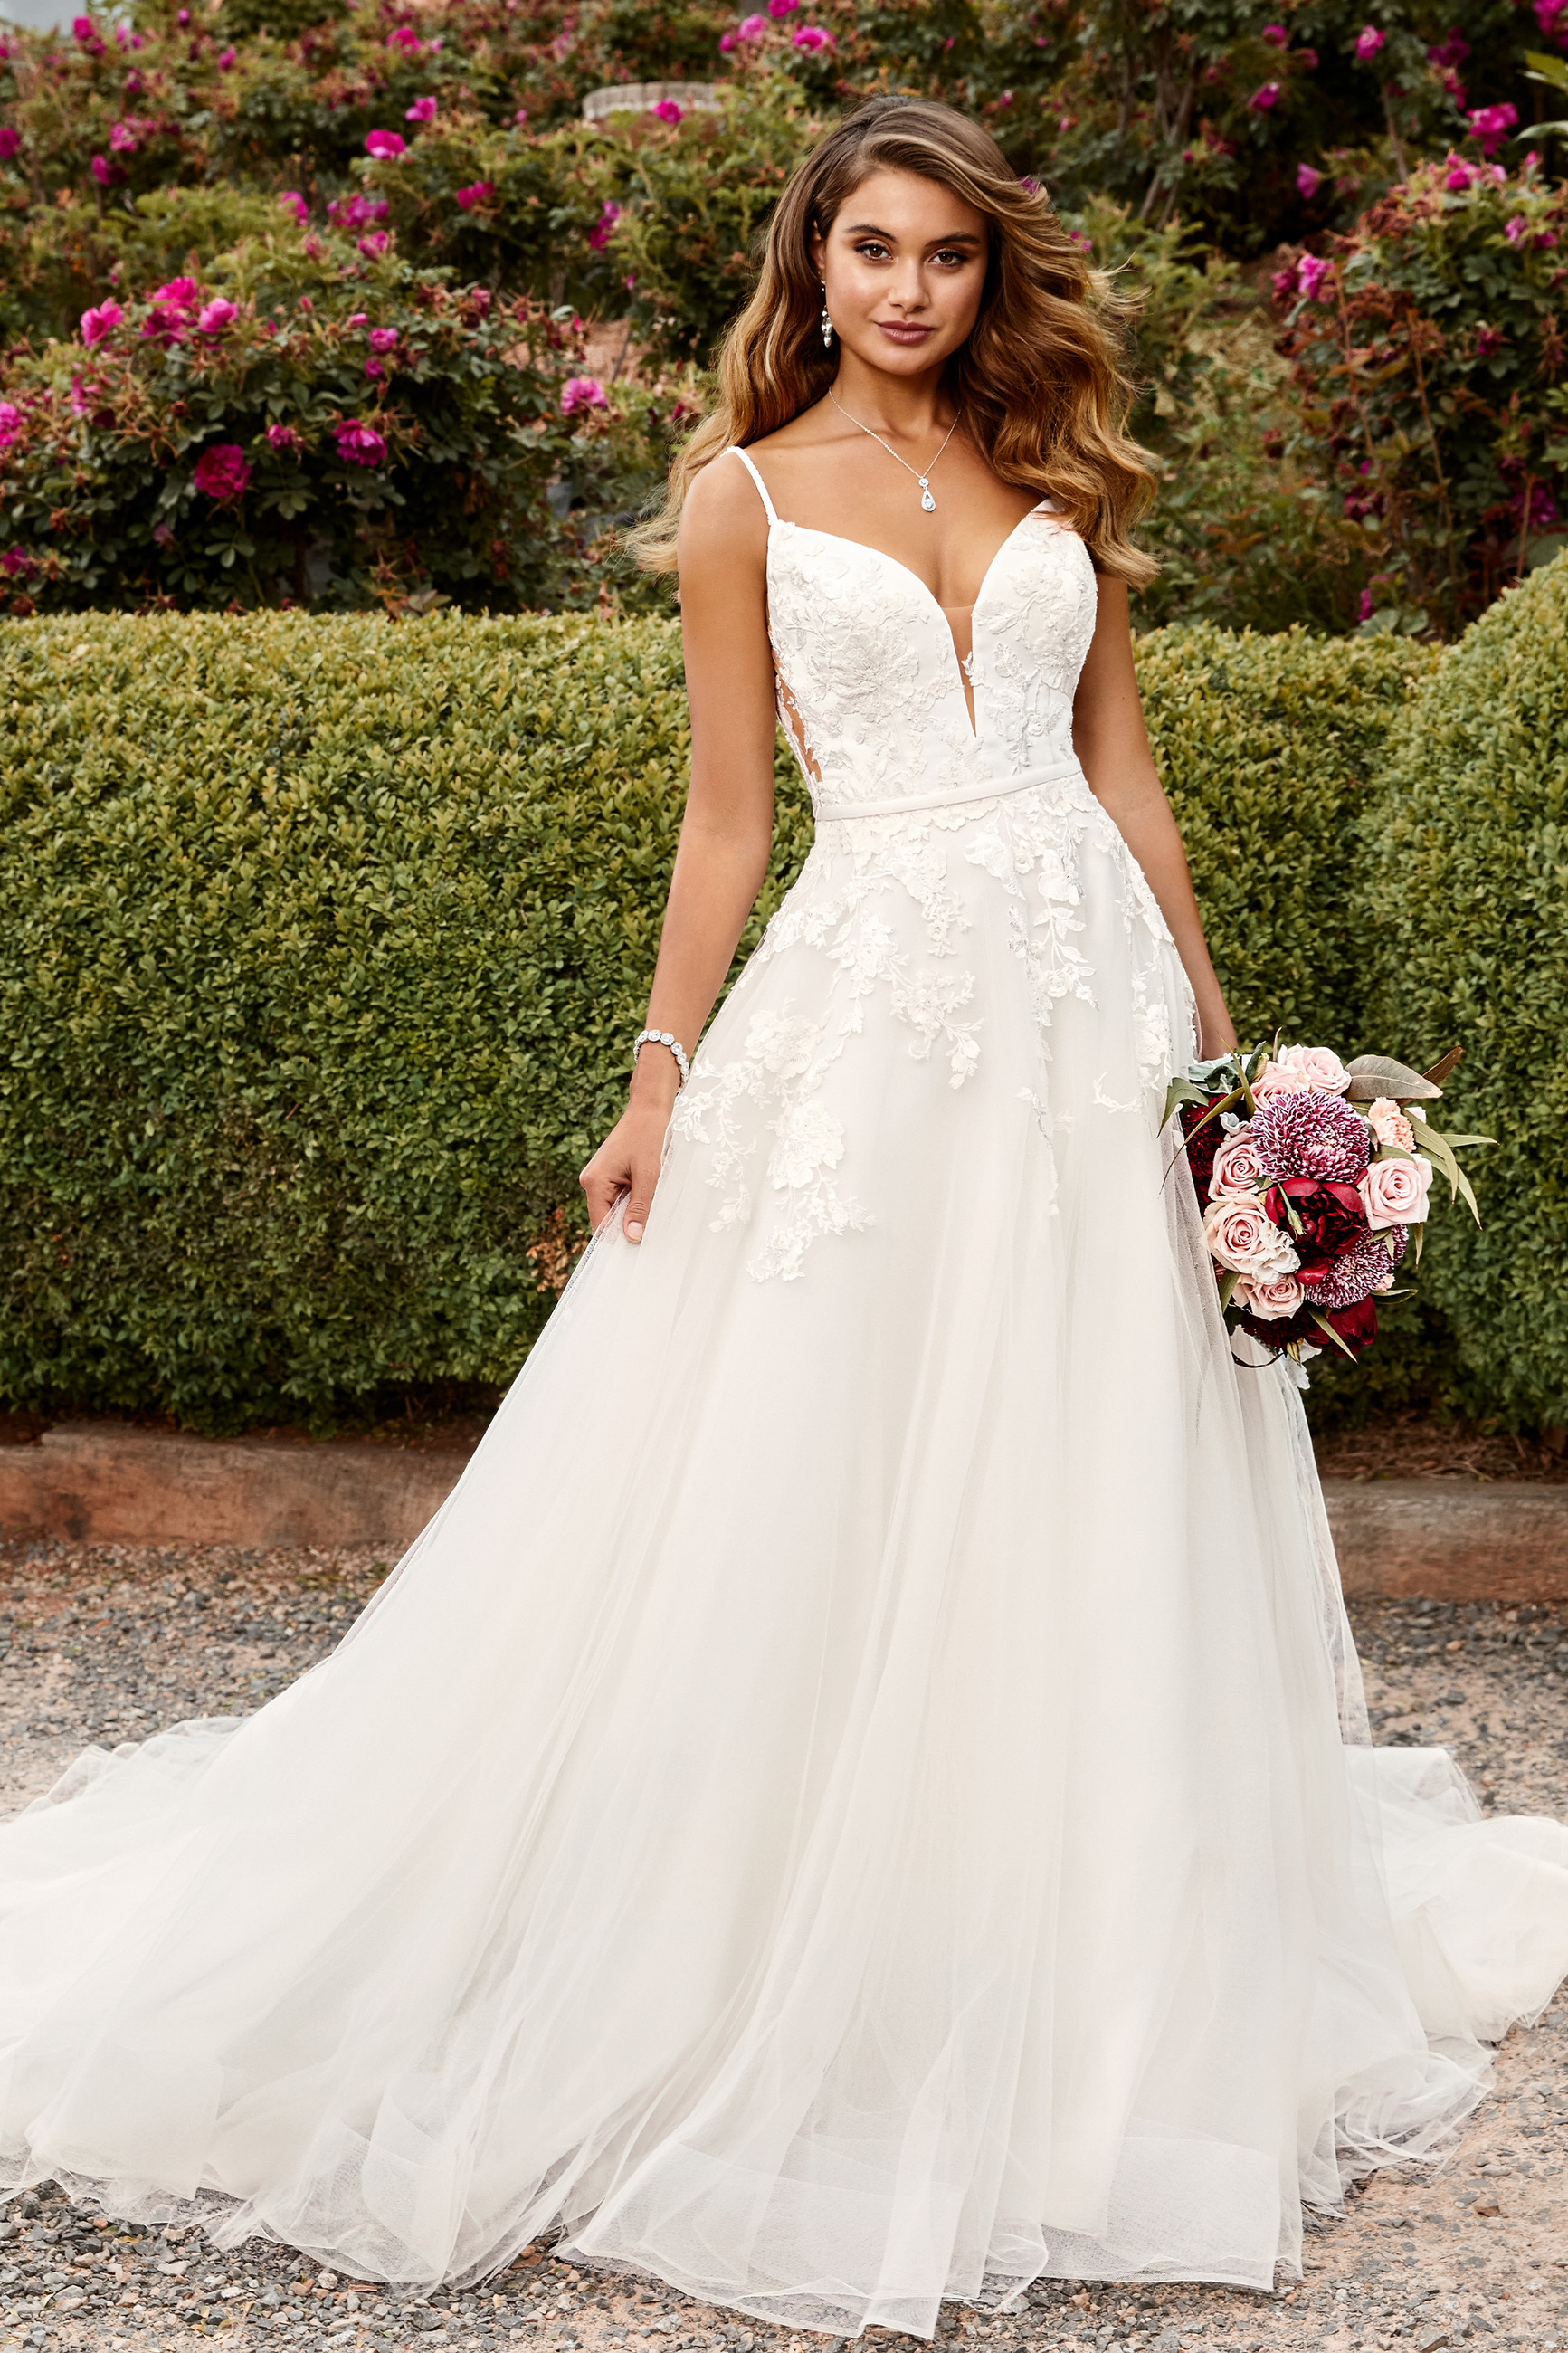 Sophia Tolli Spring 20 Bridal Dresses   Sophia Tolli